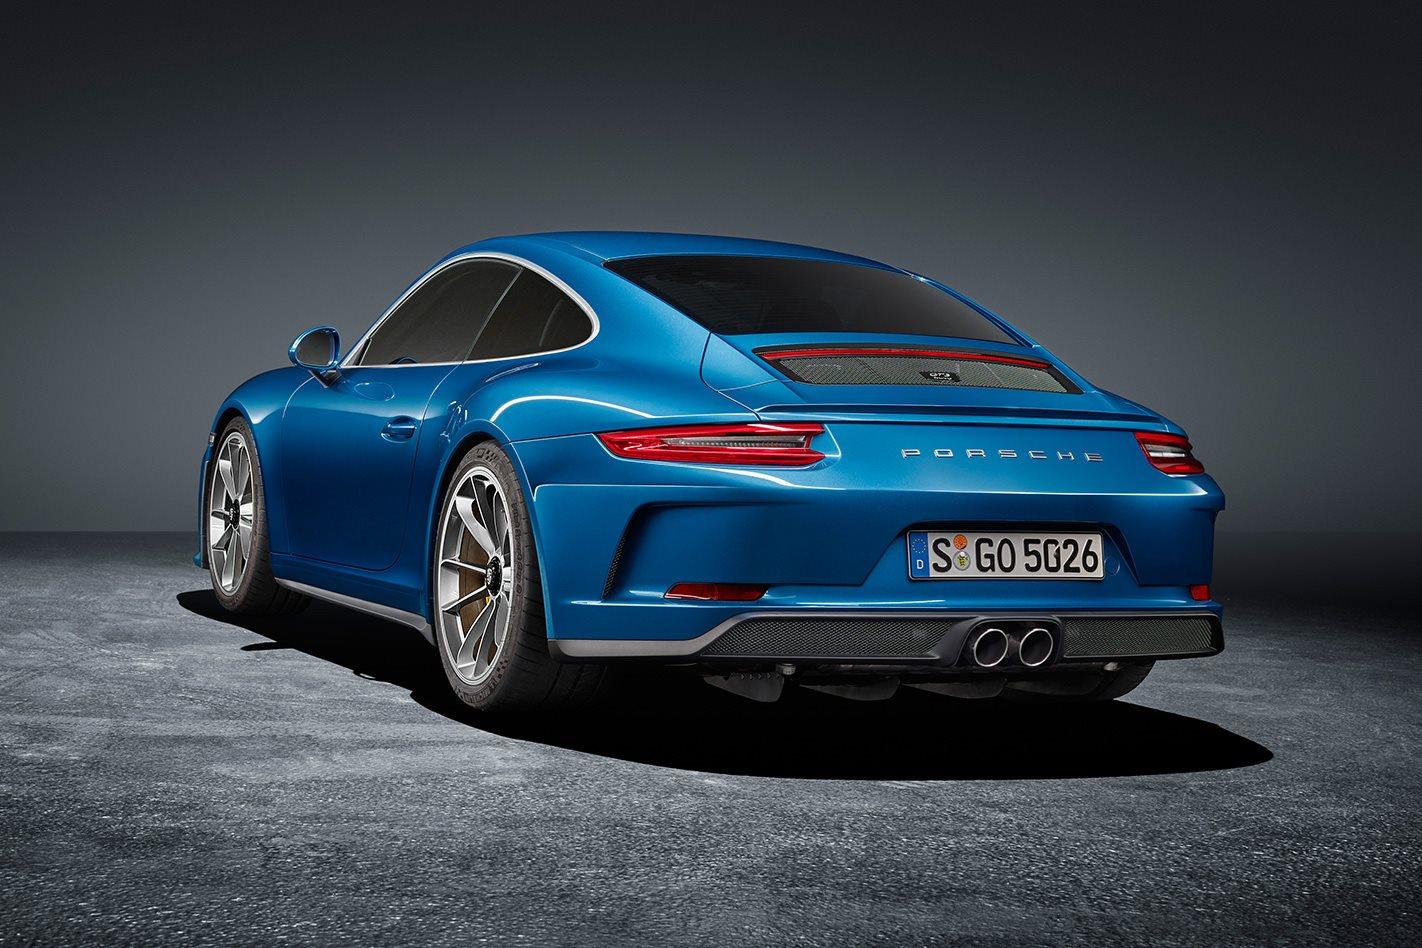 2018 Porsche 911 GT3 Touring rear